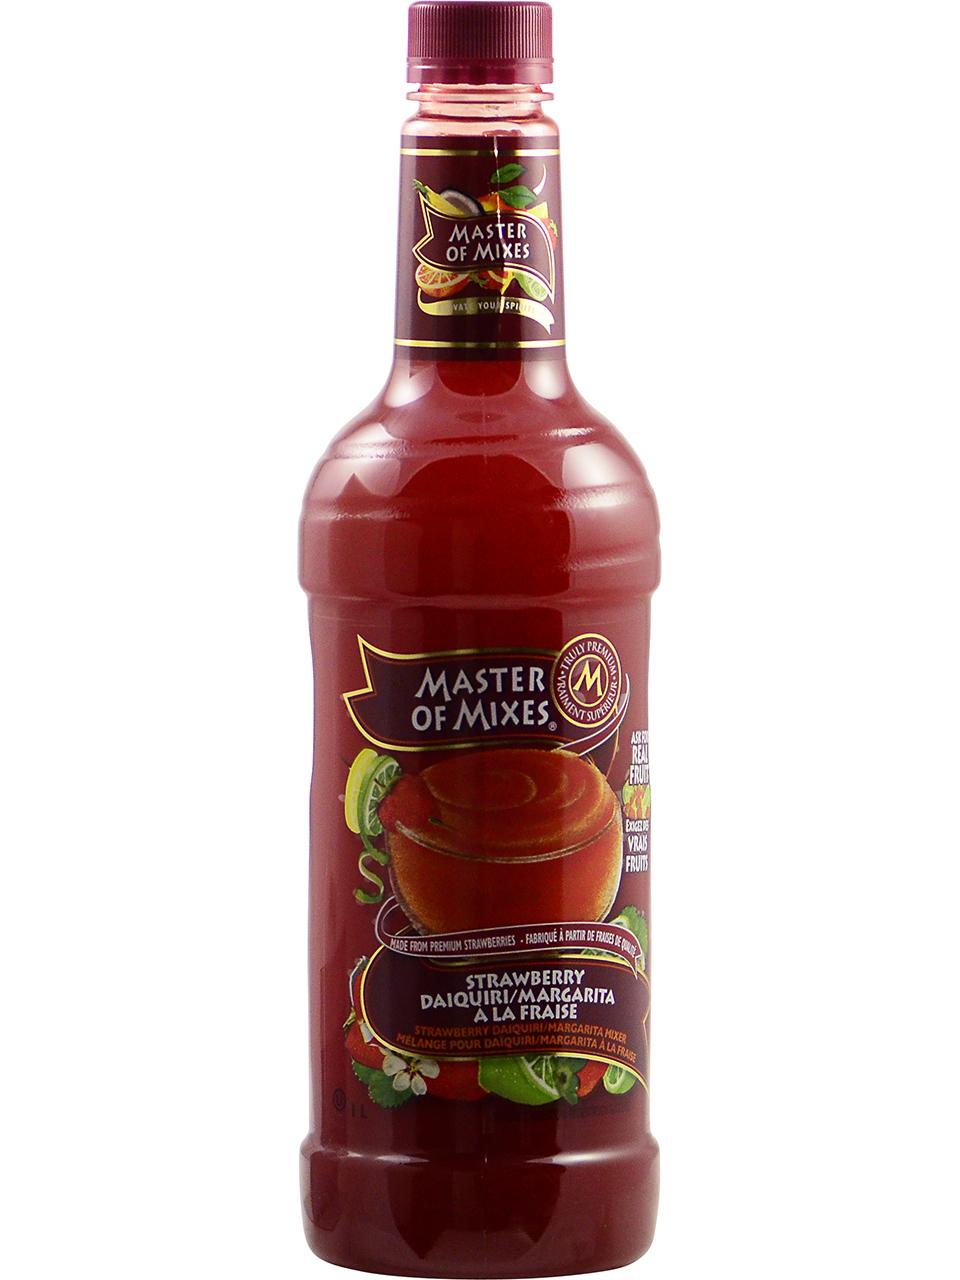 Master of Mixes Strawberry Daiquiri/Margarita Mix